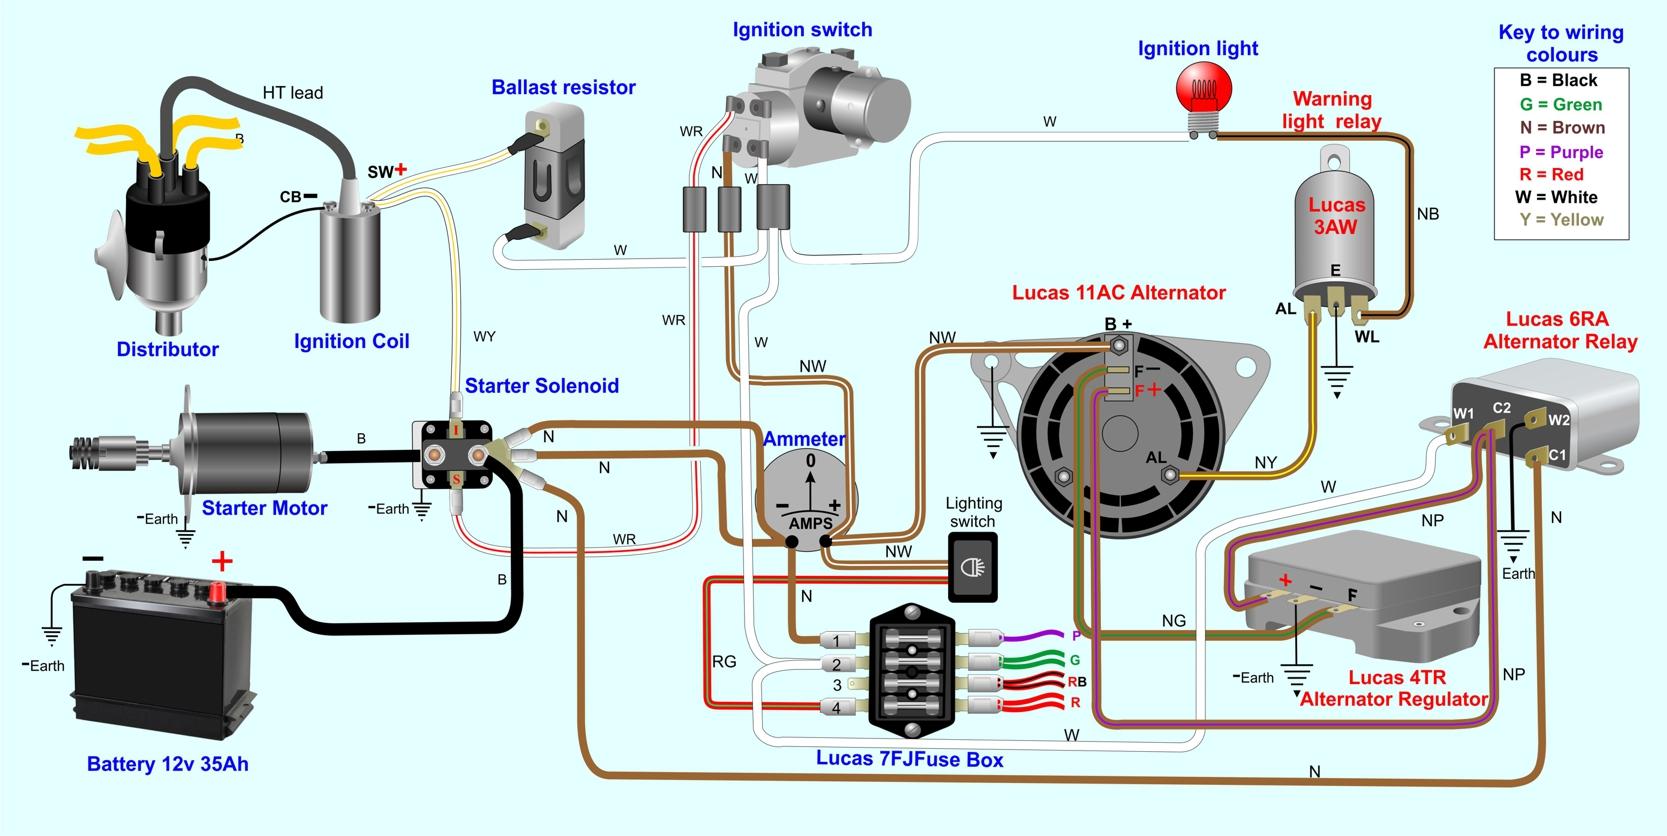 [SCHEMATICS_4FD]  Alternators | Alternator Wiring Diagram Lucas |  | The rebuild of a Morgan | Reconstructing Morgan bodywork